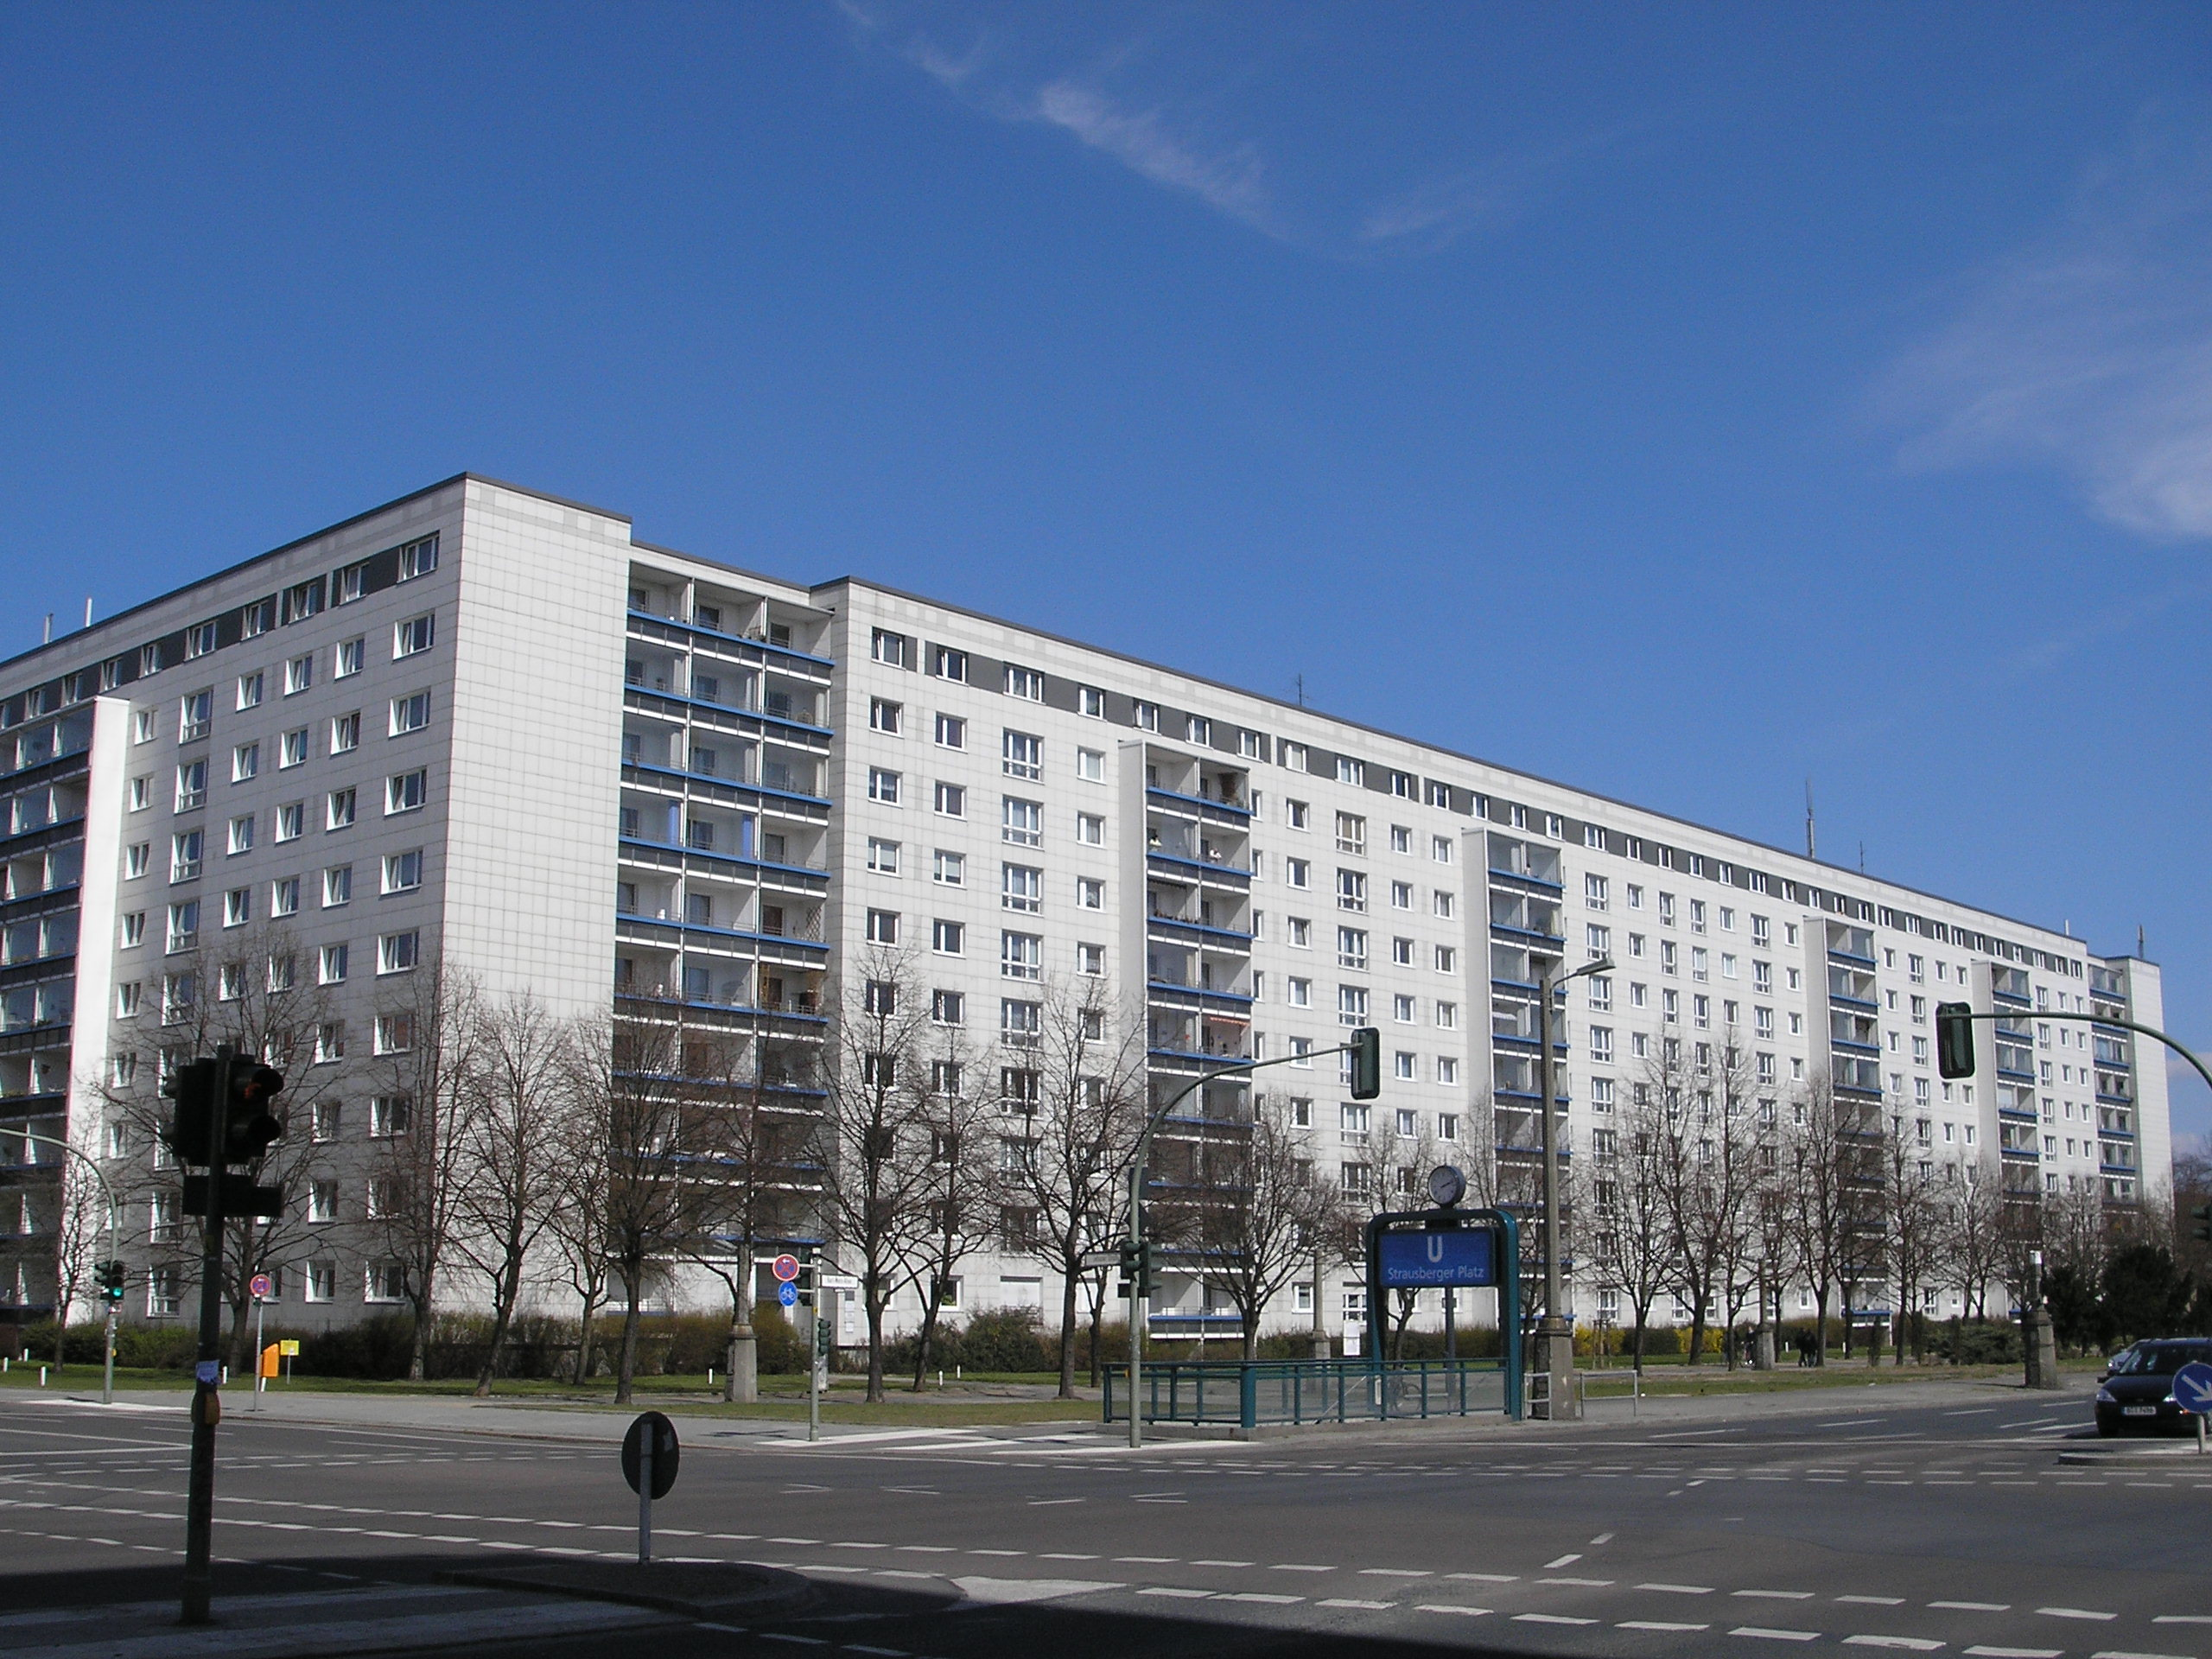 file karl marx allee plattenbau nord berlin april 2006 wikimedia commons. Black Bedroom Furniture Sets. Home Design Ideas